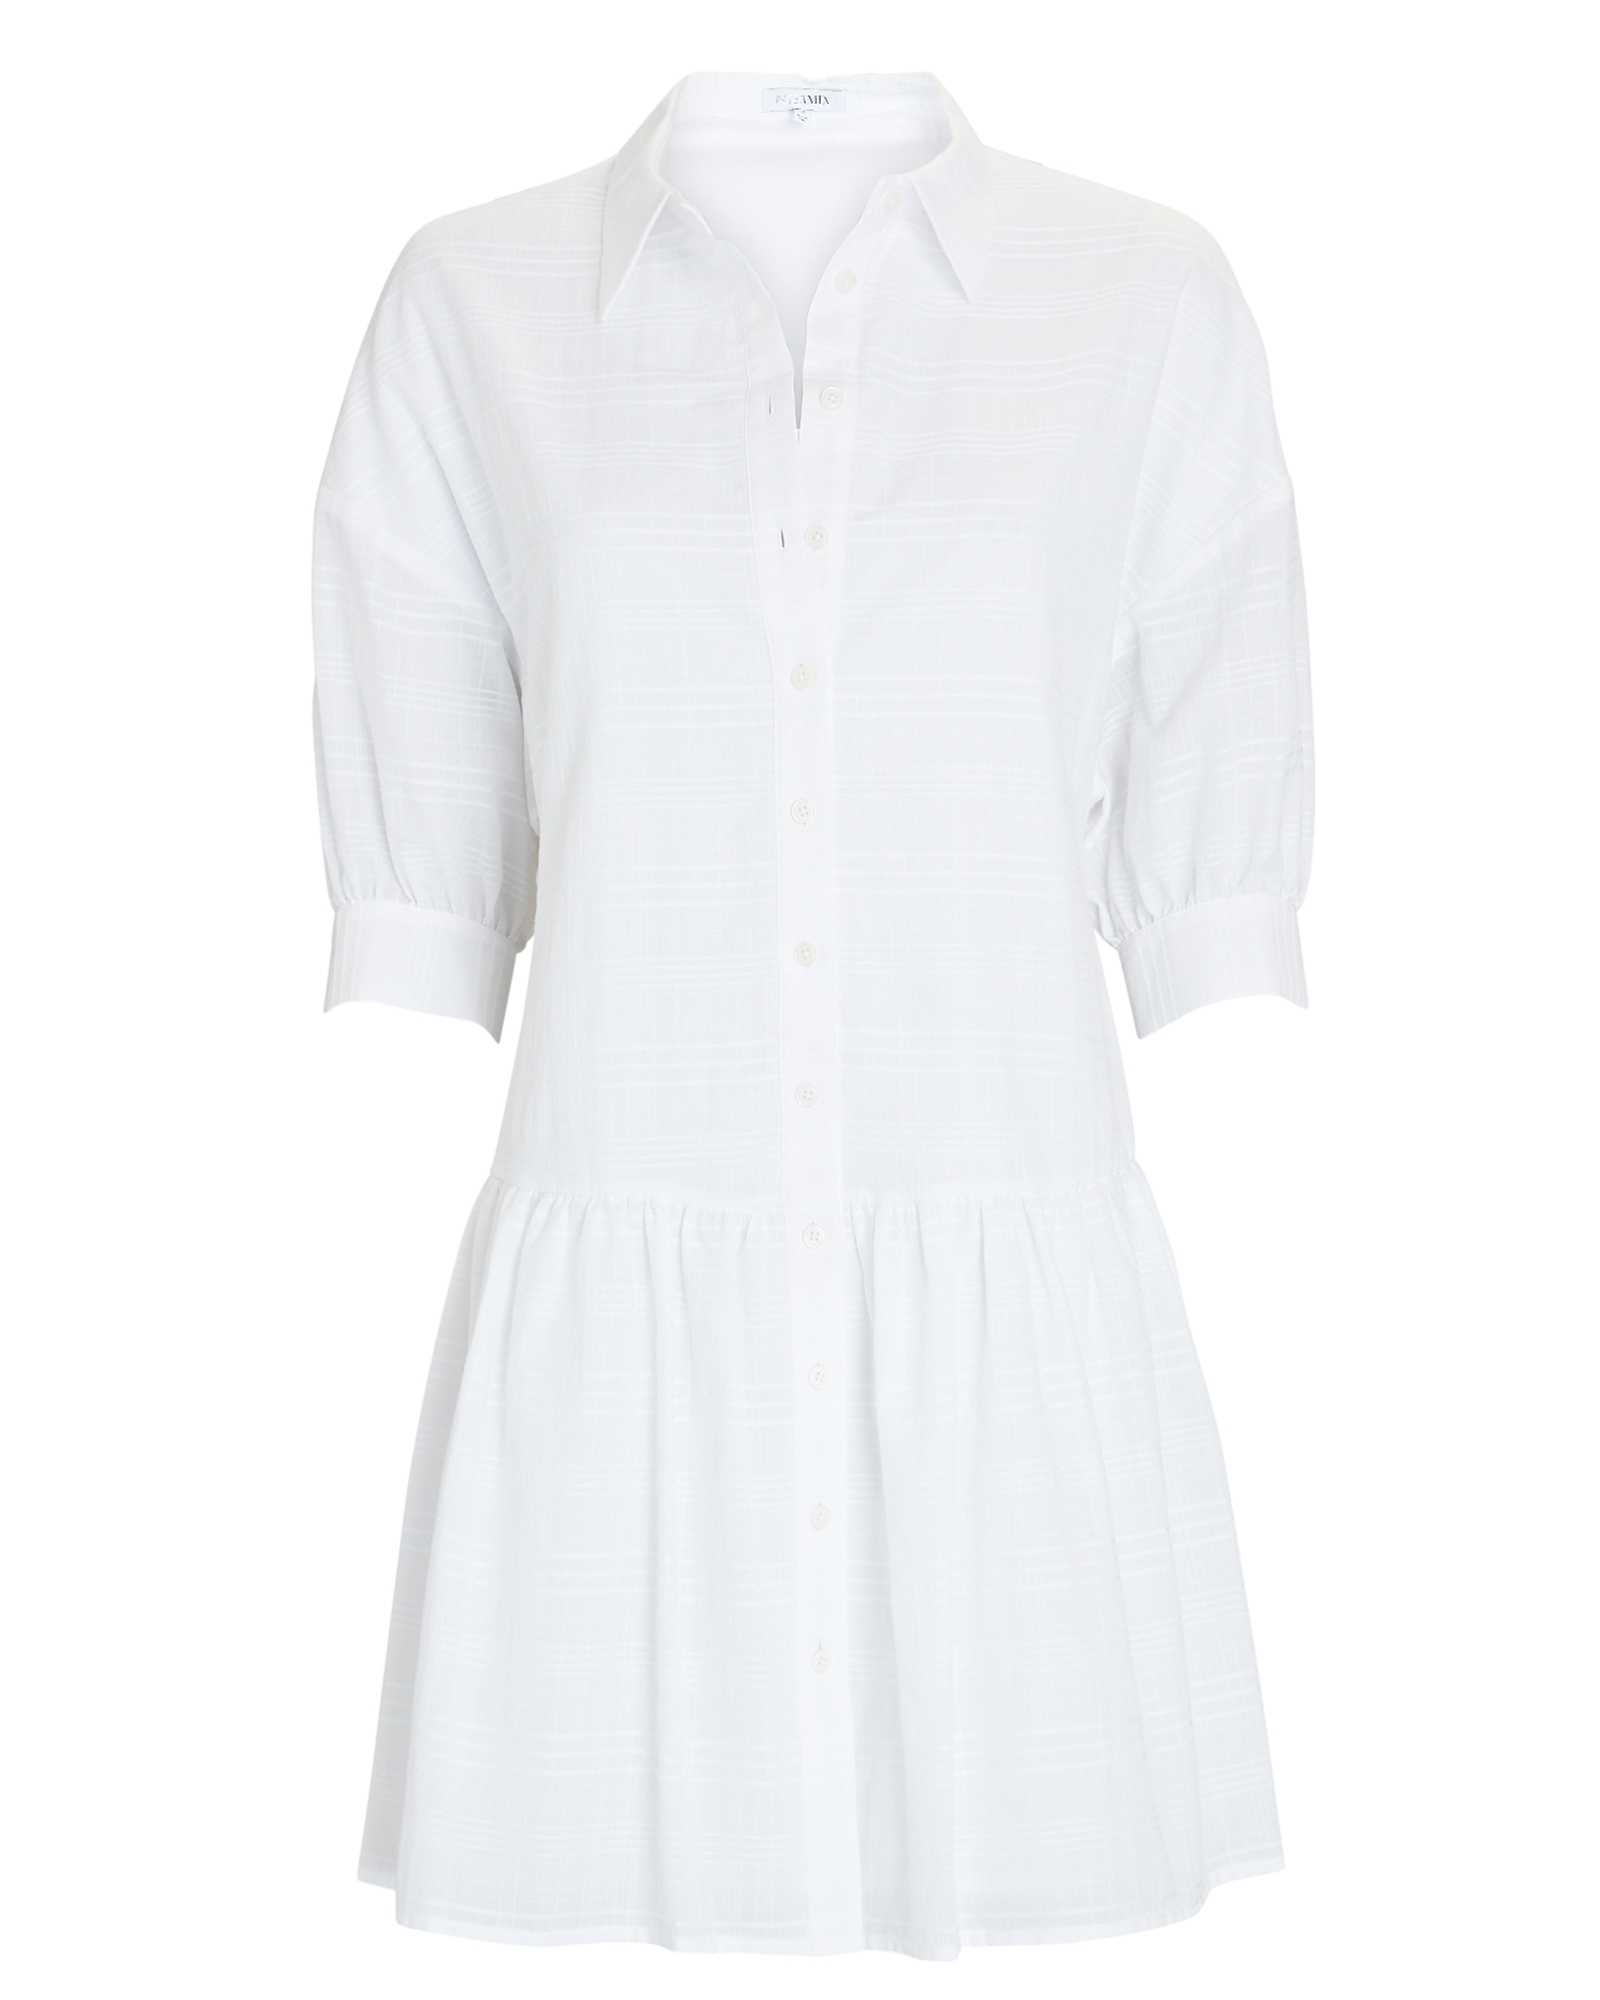 Noelle Cotton Mini Shirt Dress